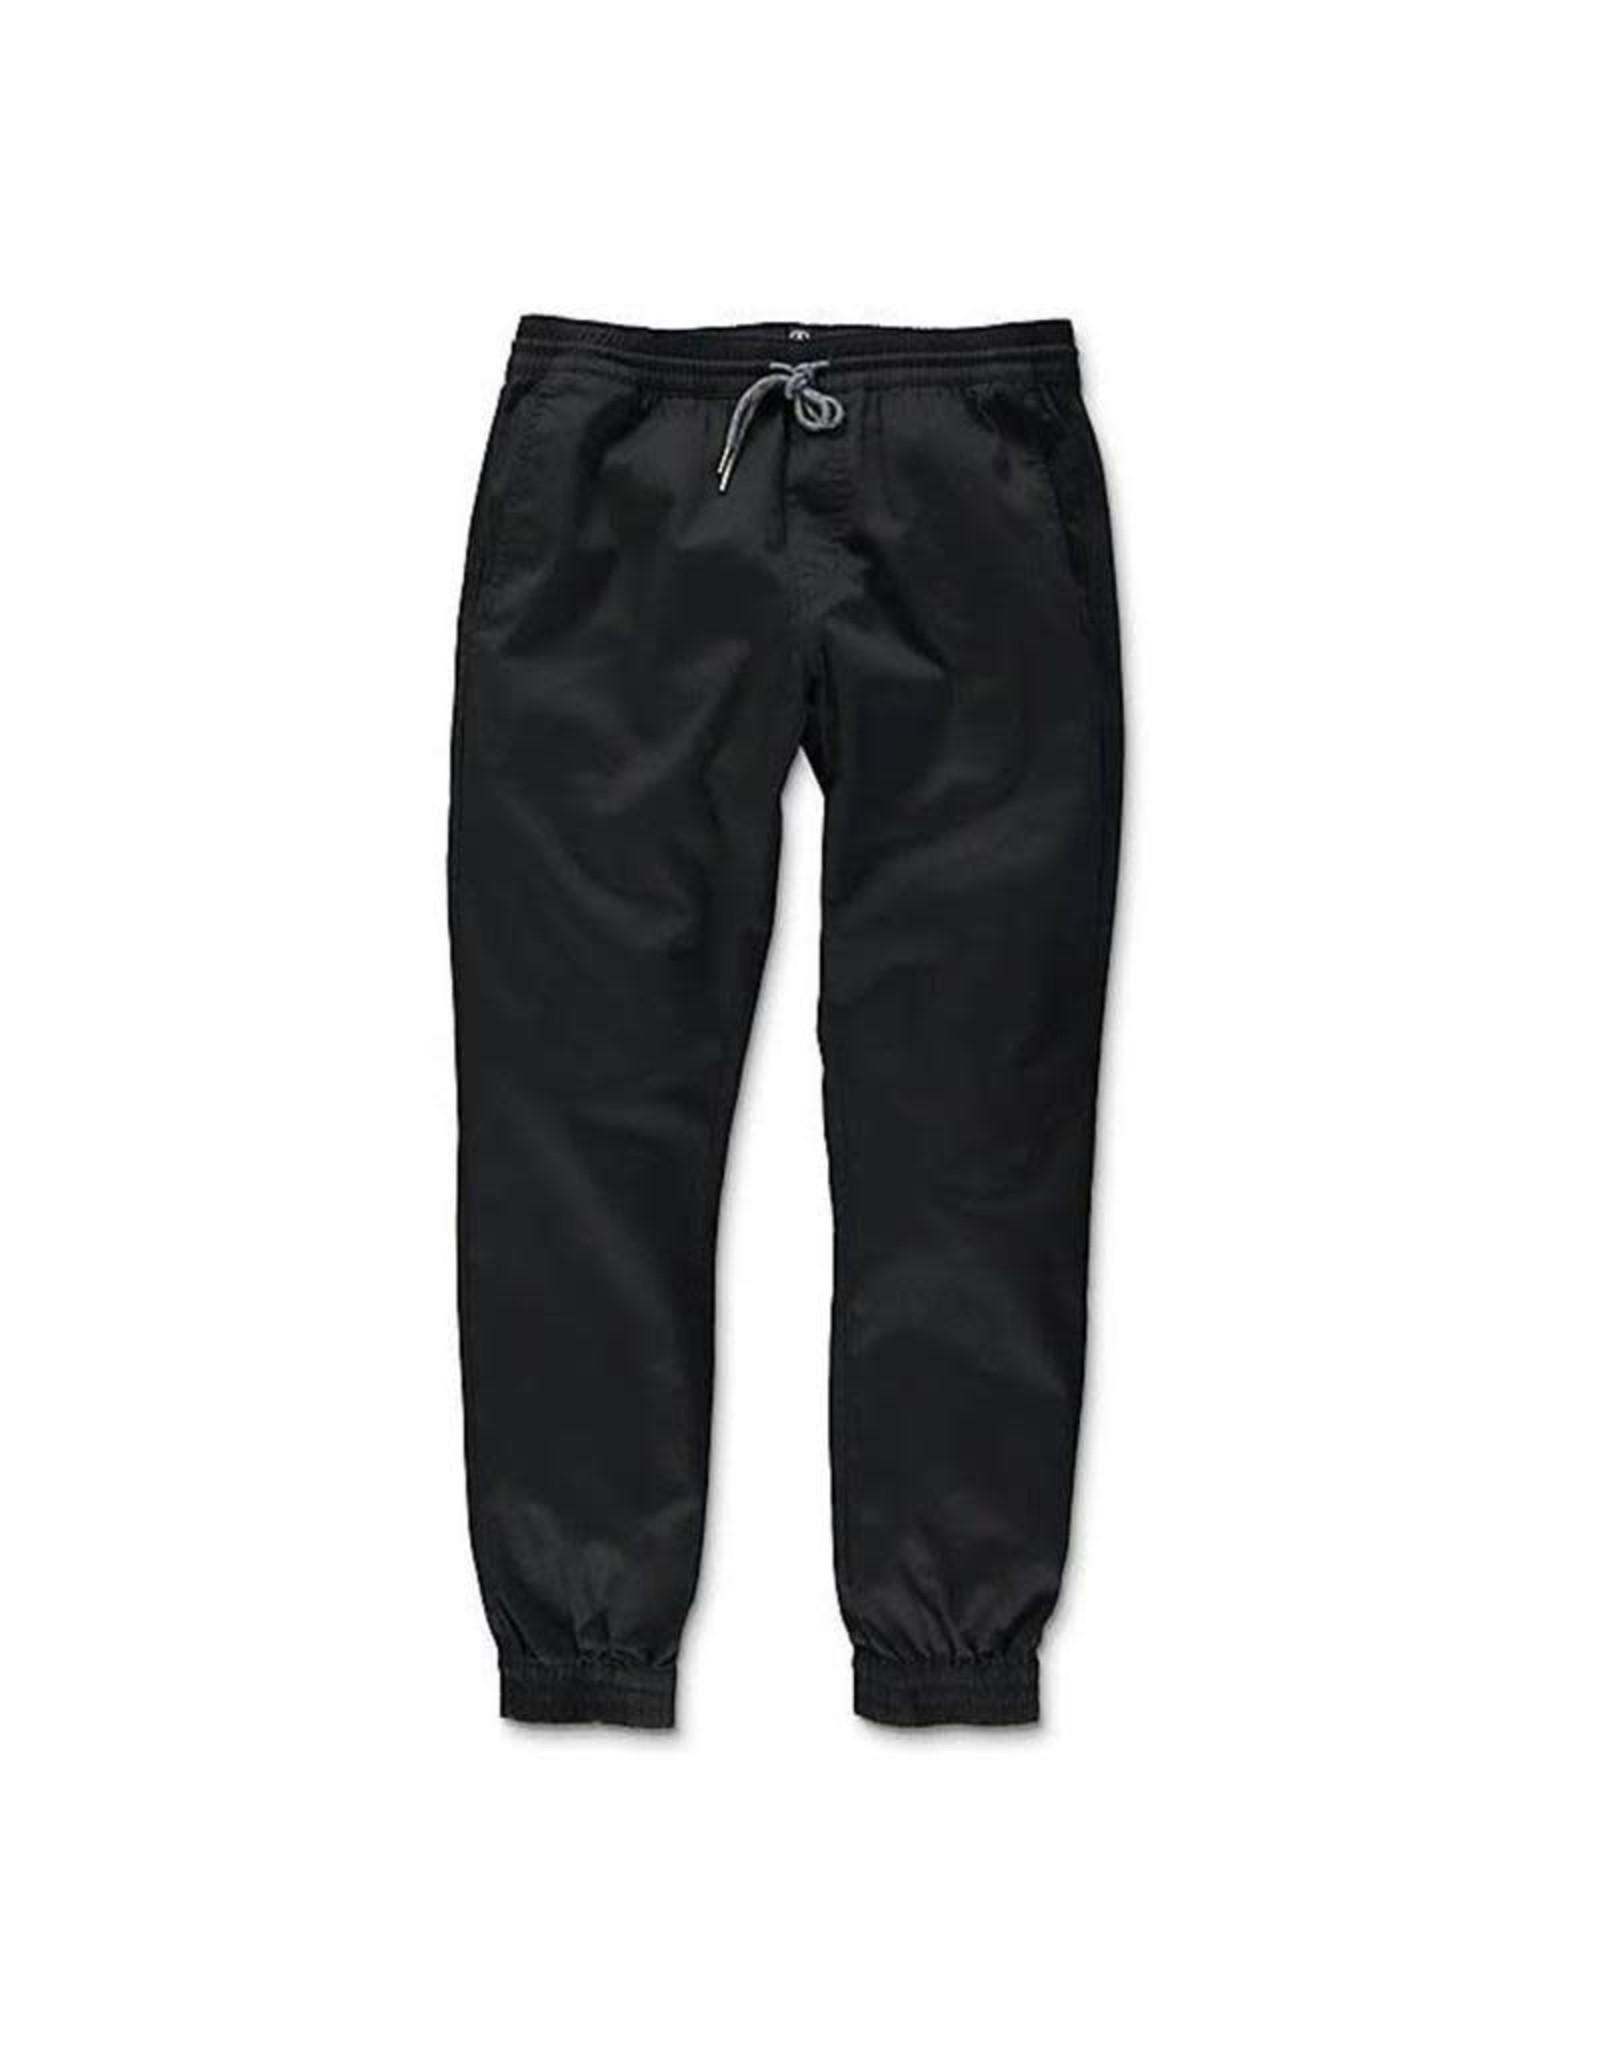 volcom Volcom - Pantalon junior frickin slim jogger black